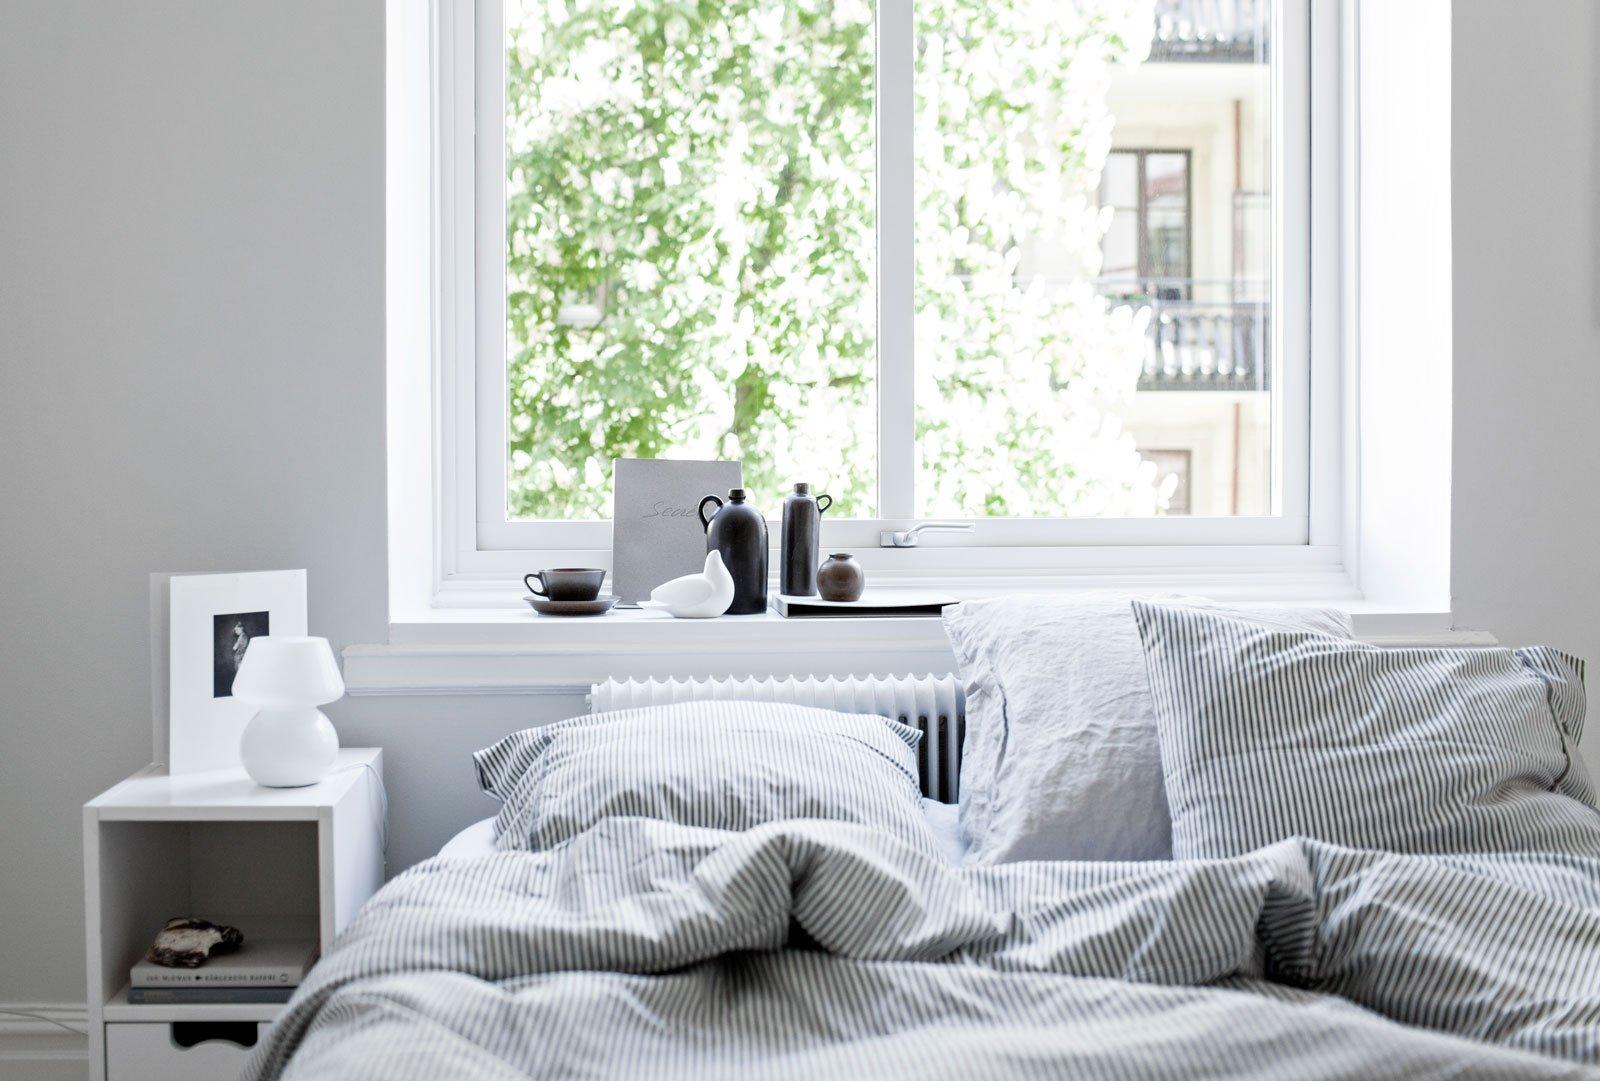 bedroom cozy light calm